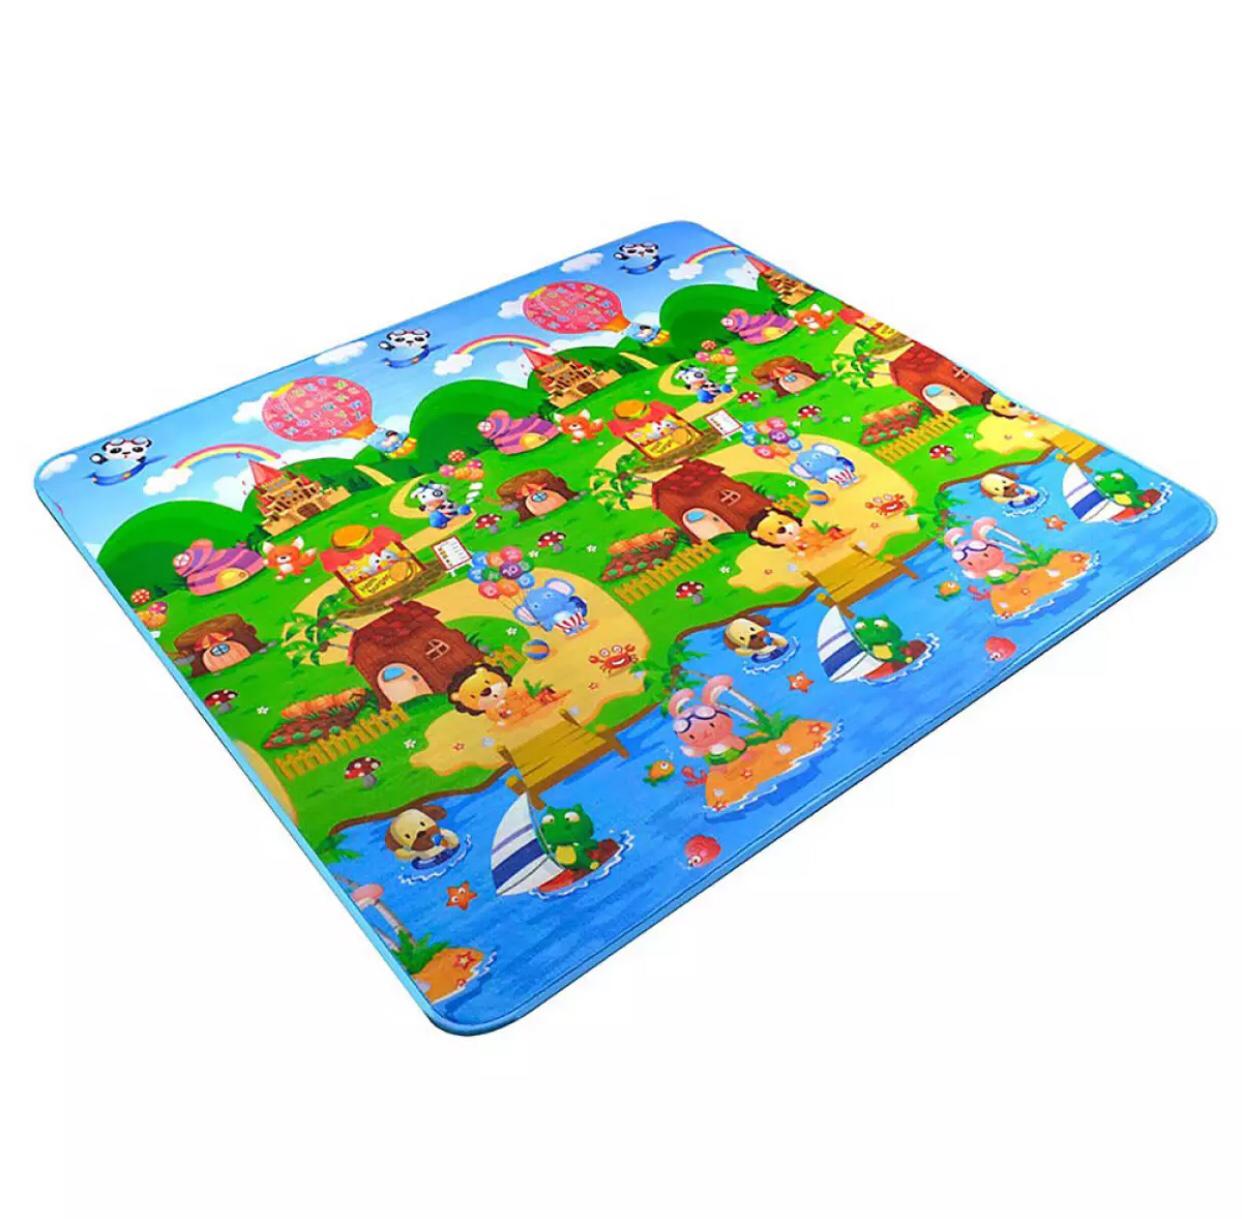 Large Activity Baby Play Mat (2m*1,8m)